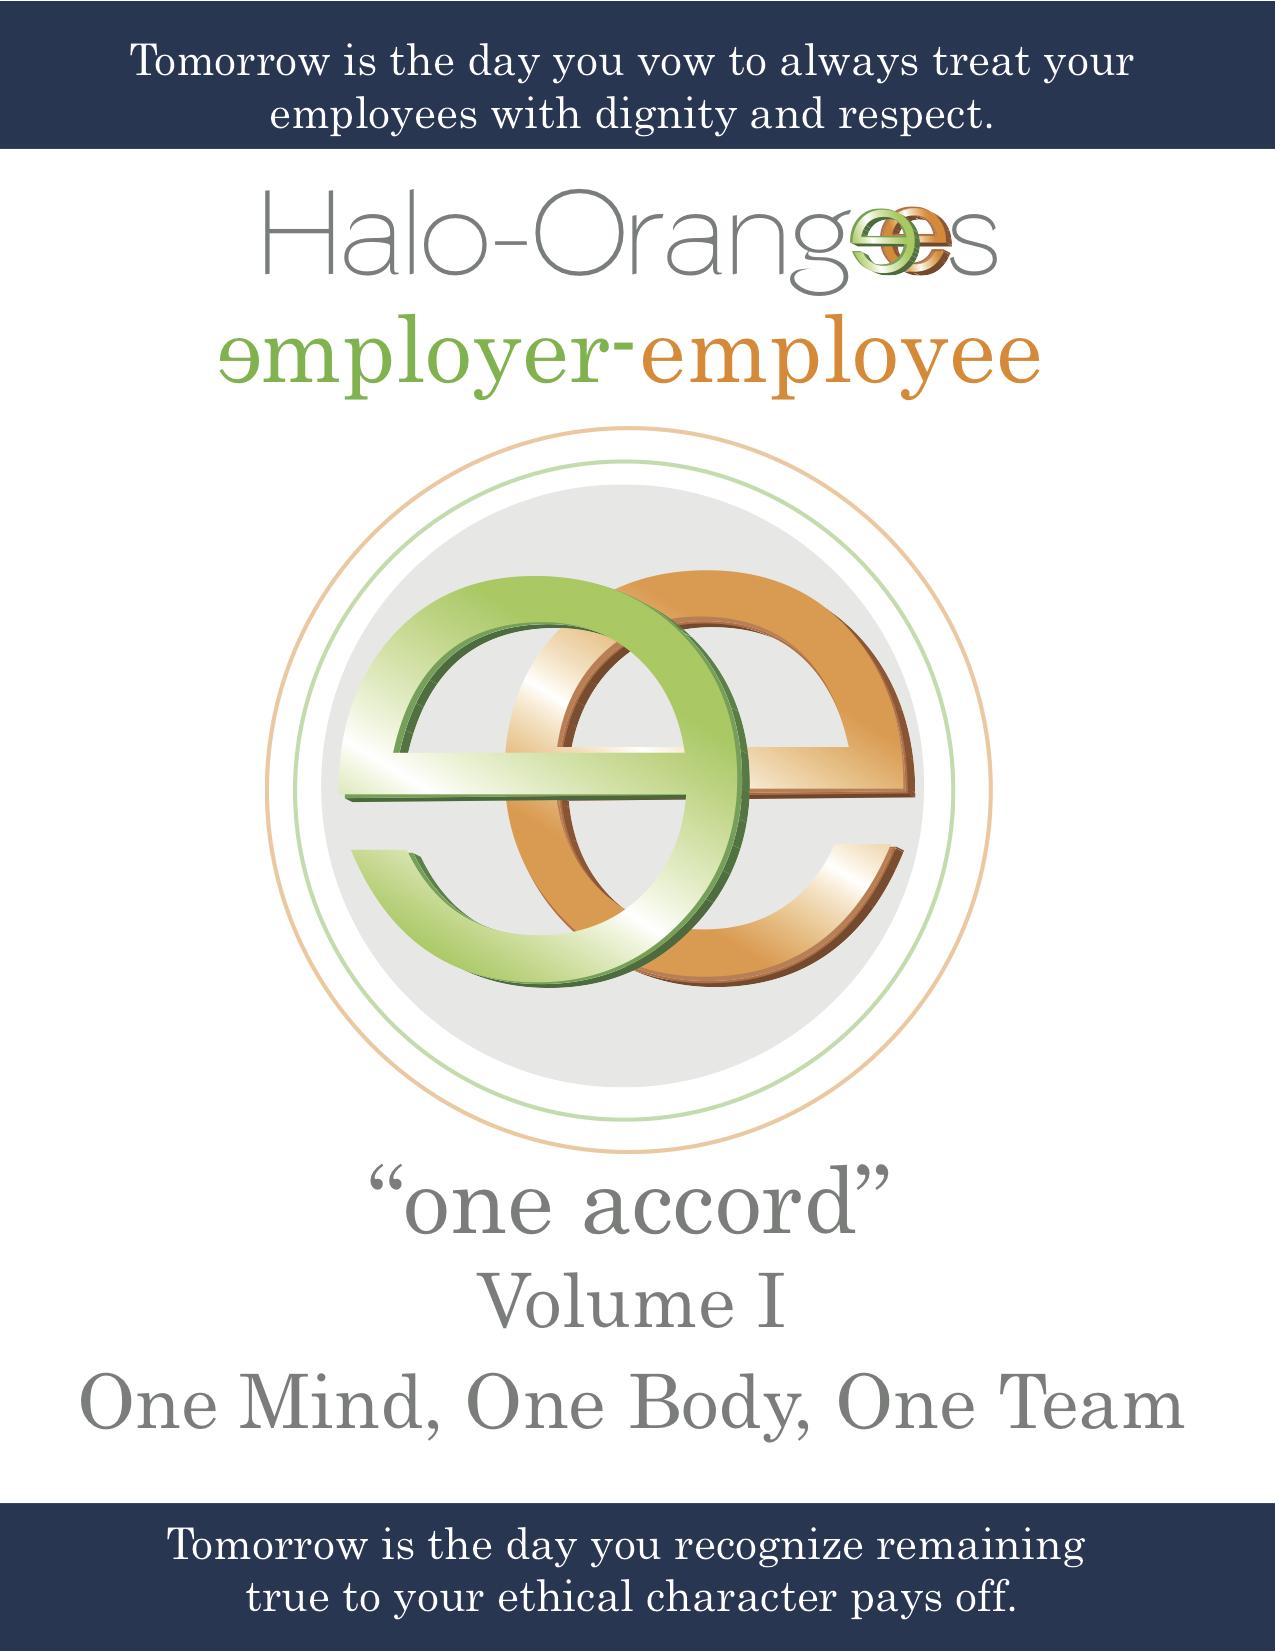 Halo-Orangees employer-employee one accord Volume I One Mind, One Body, One Team